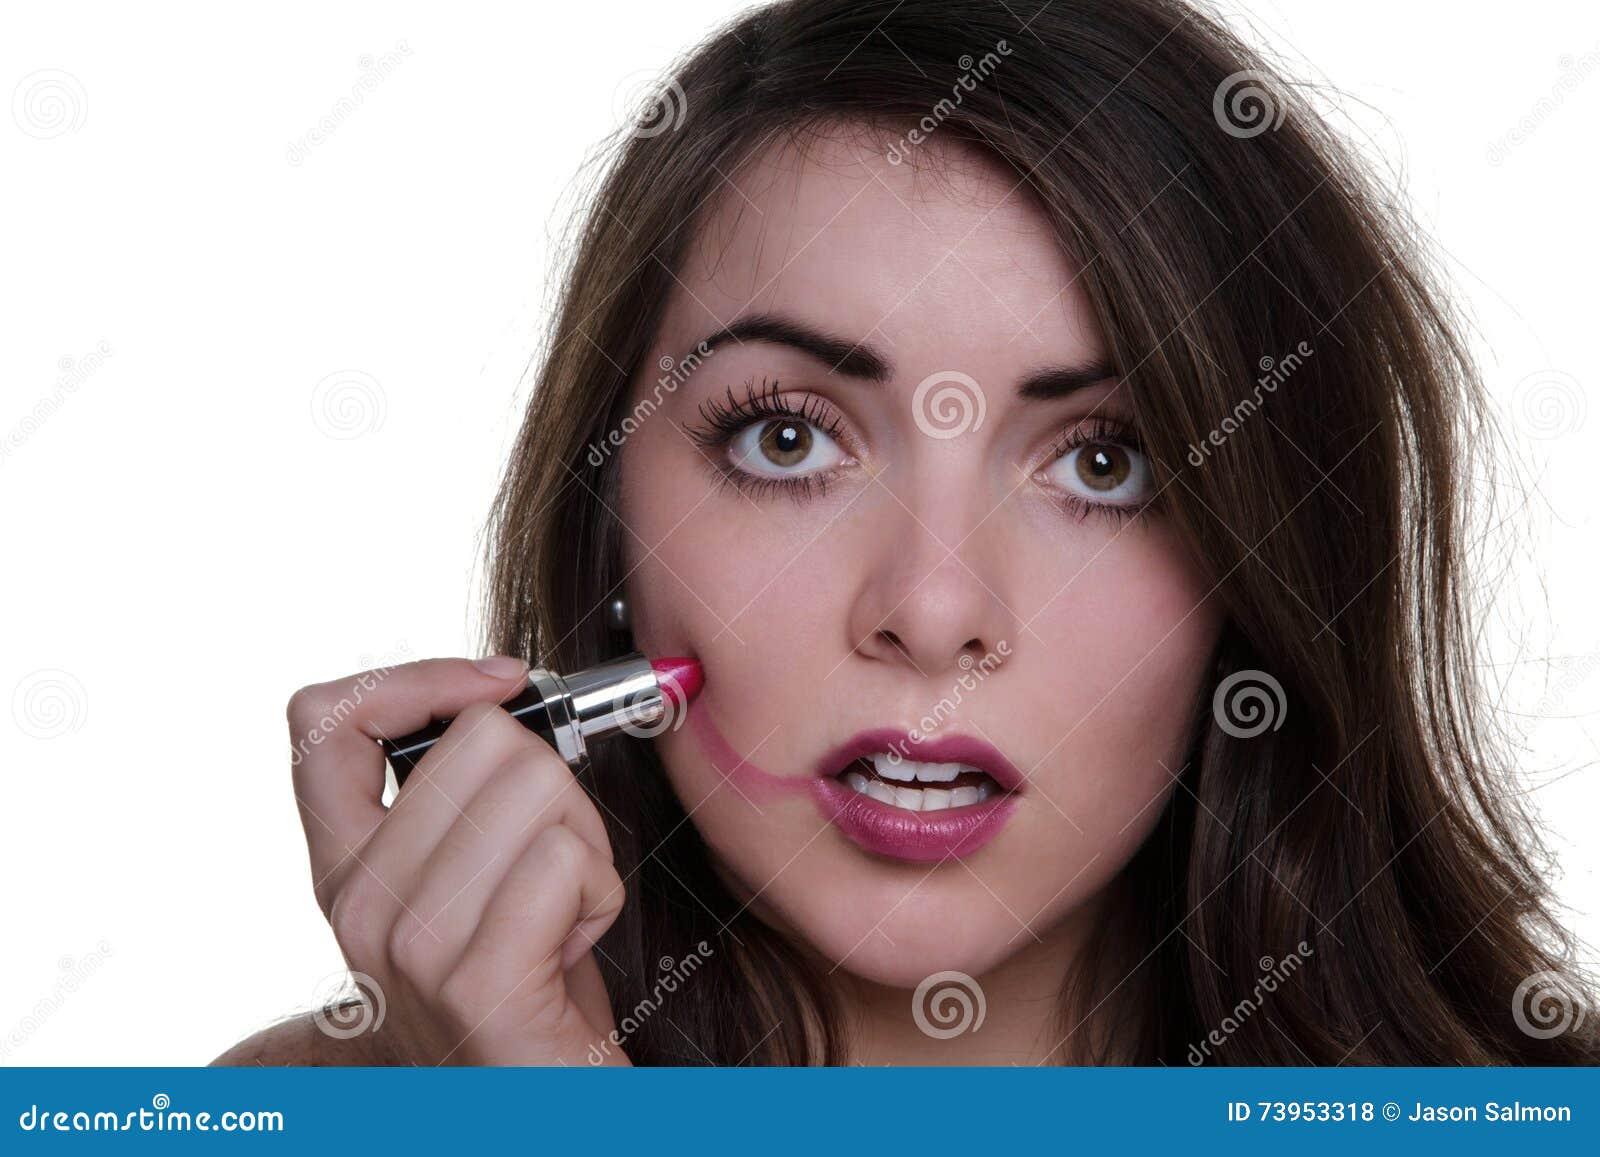 Bad make up day